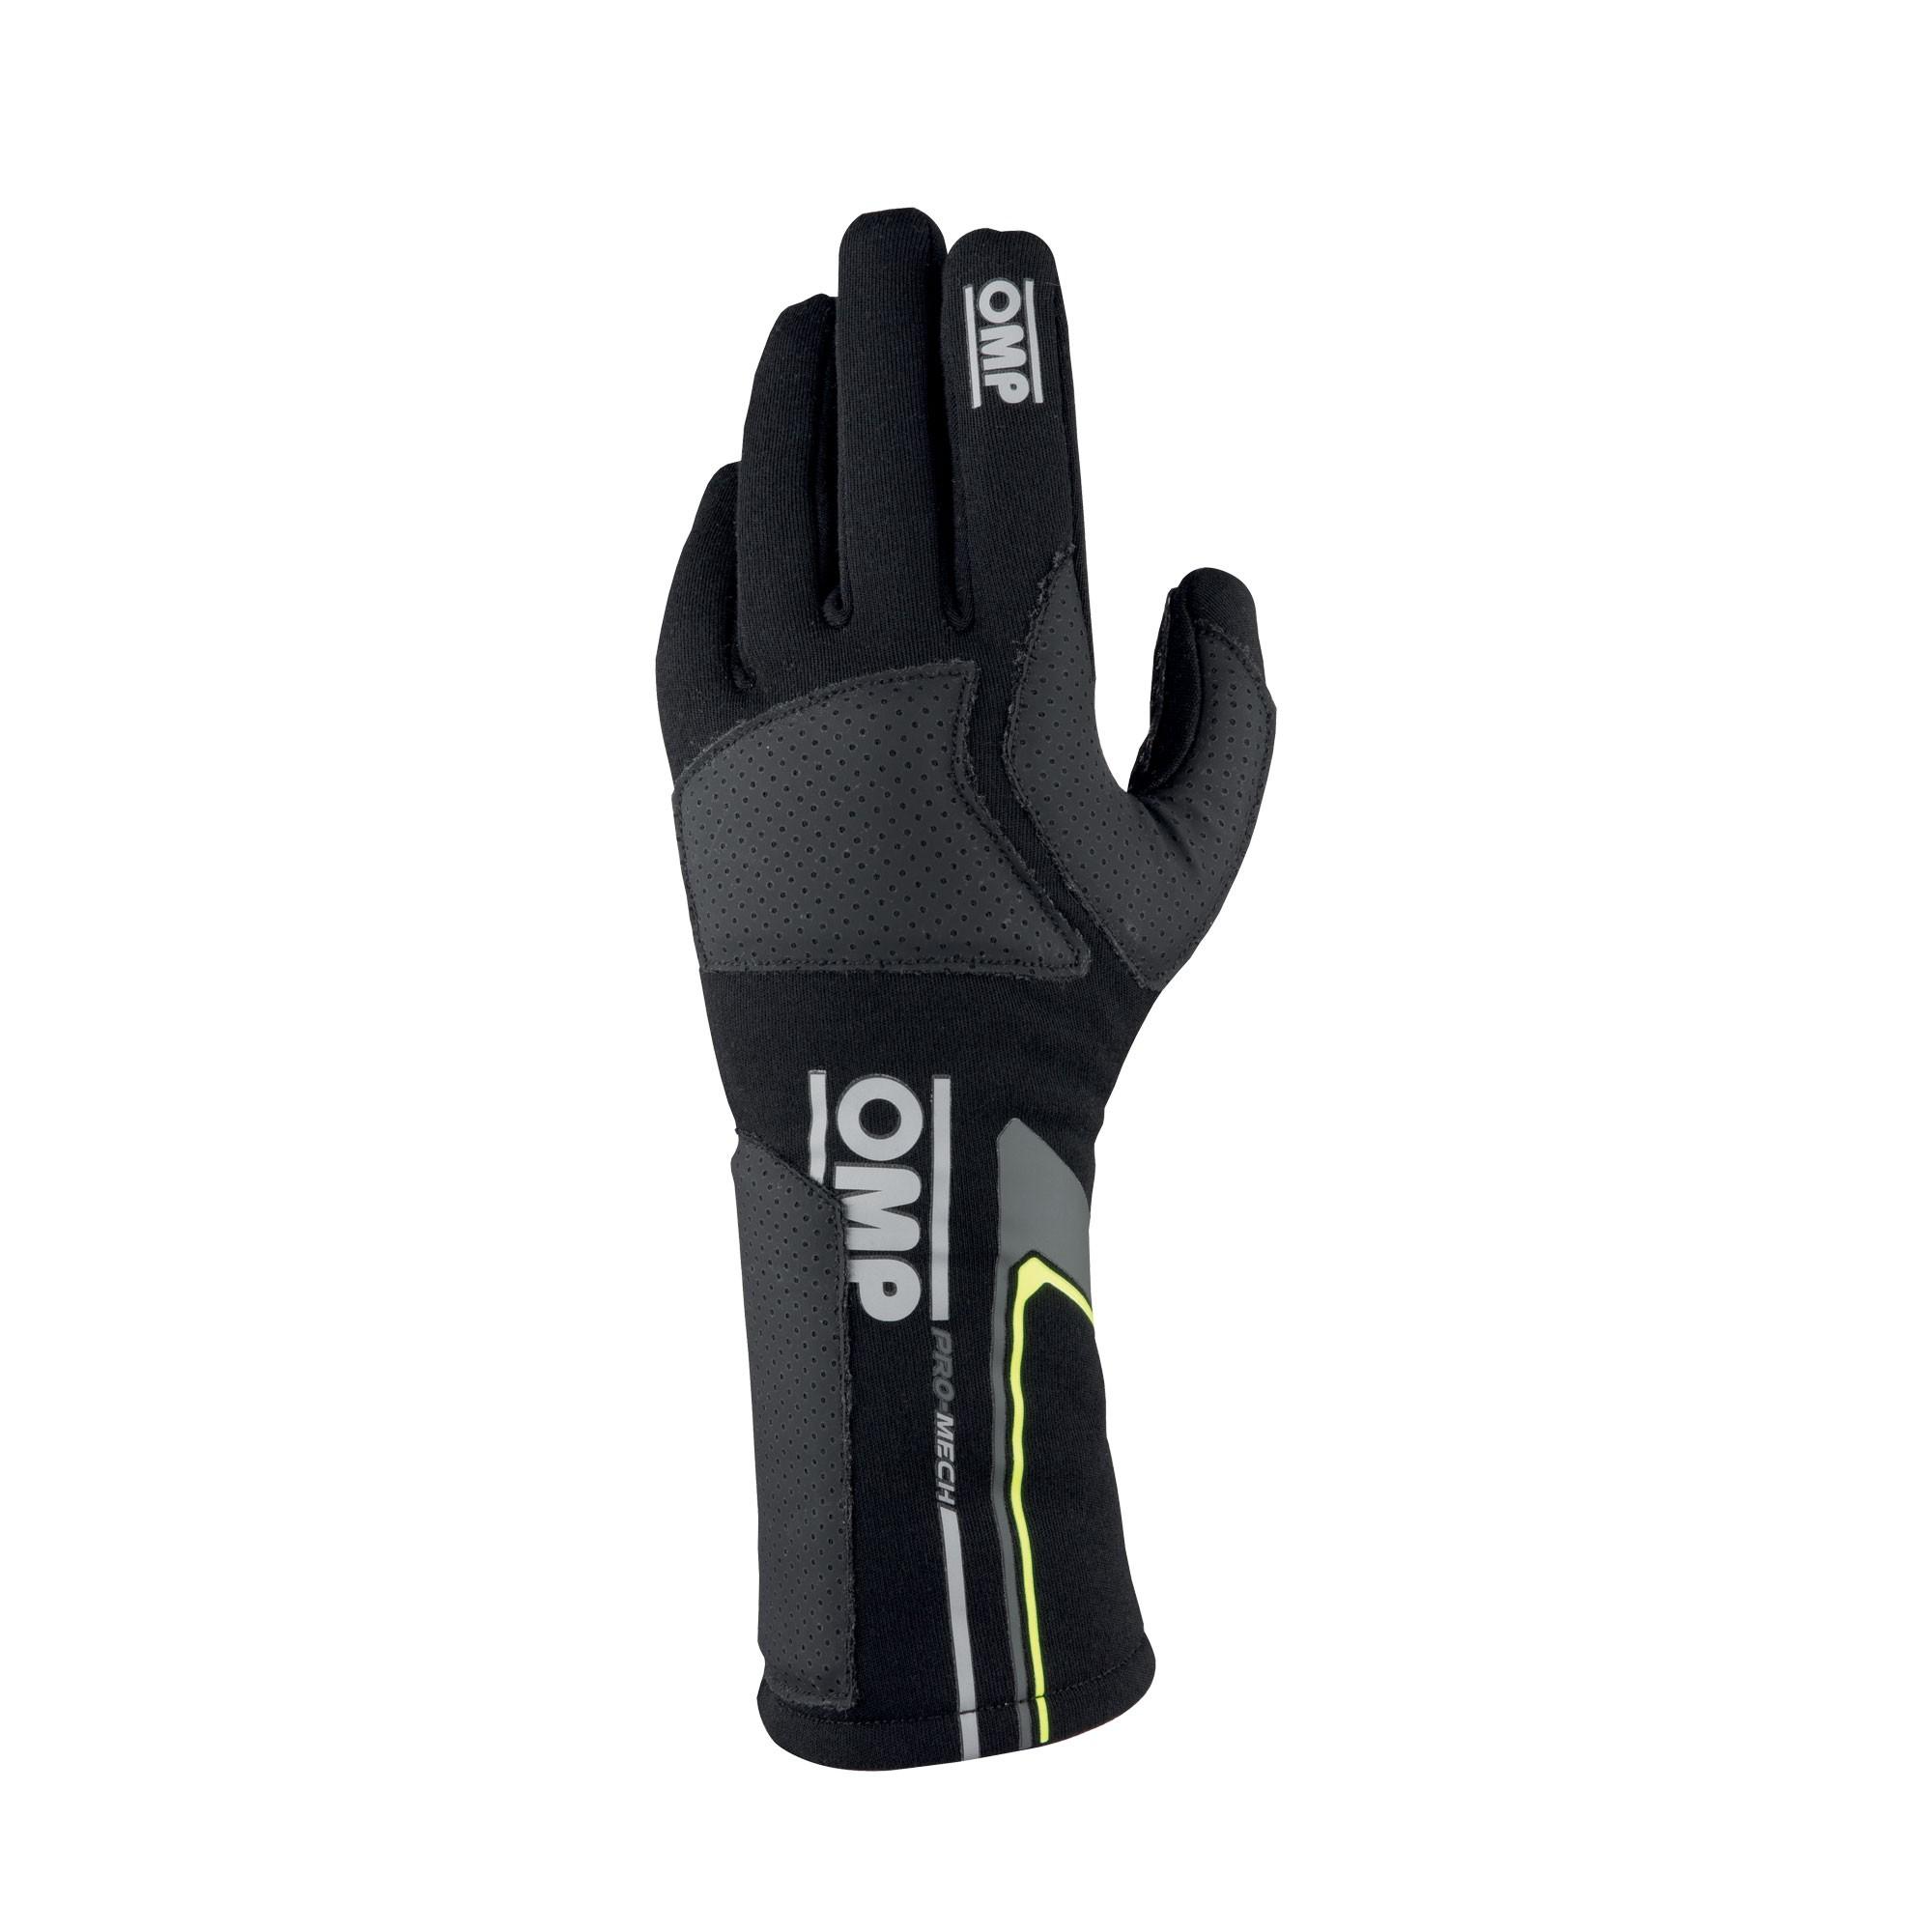 PRO Mech EVO Gloves